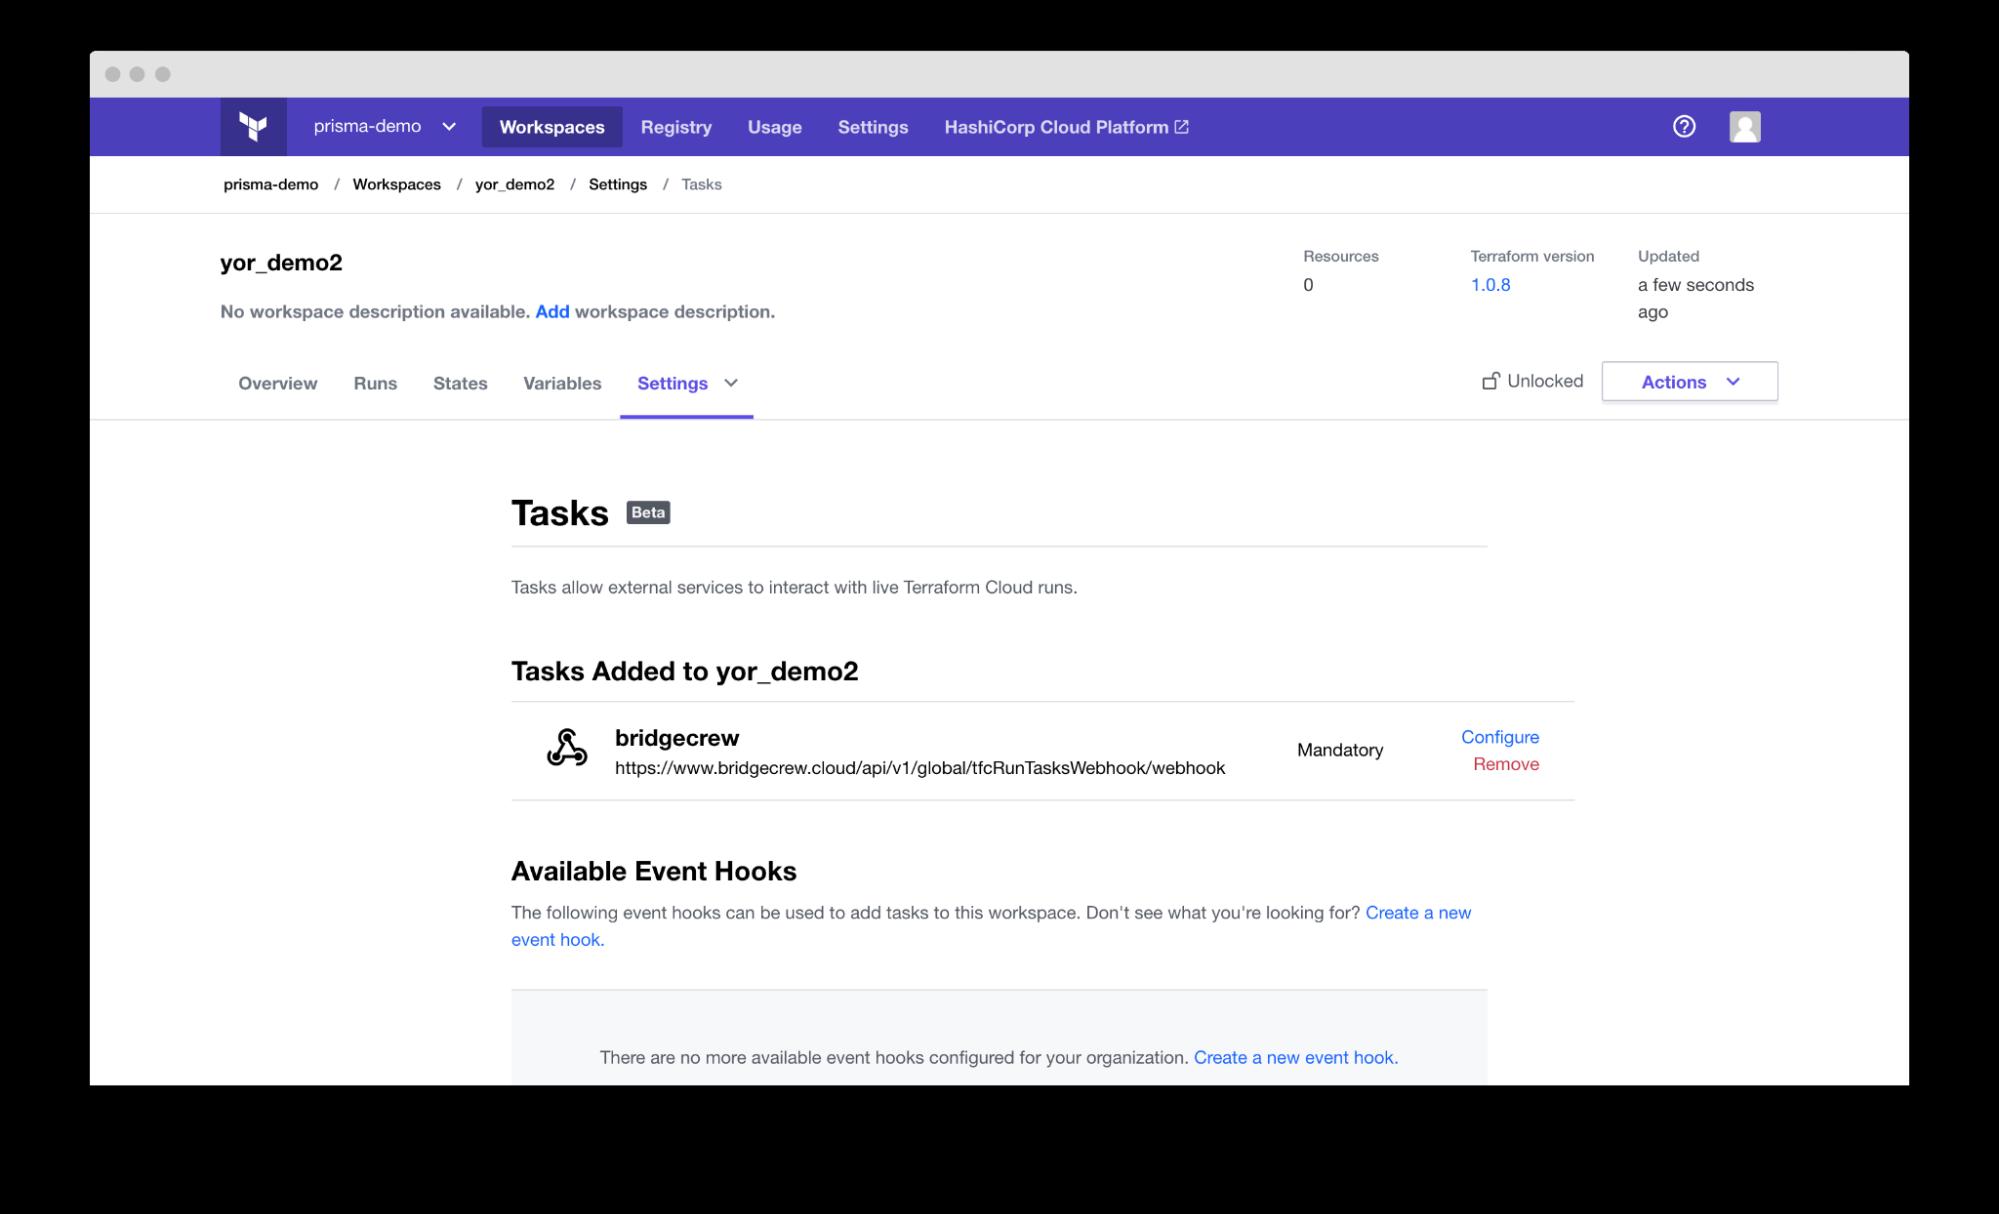 screenshot of tasks